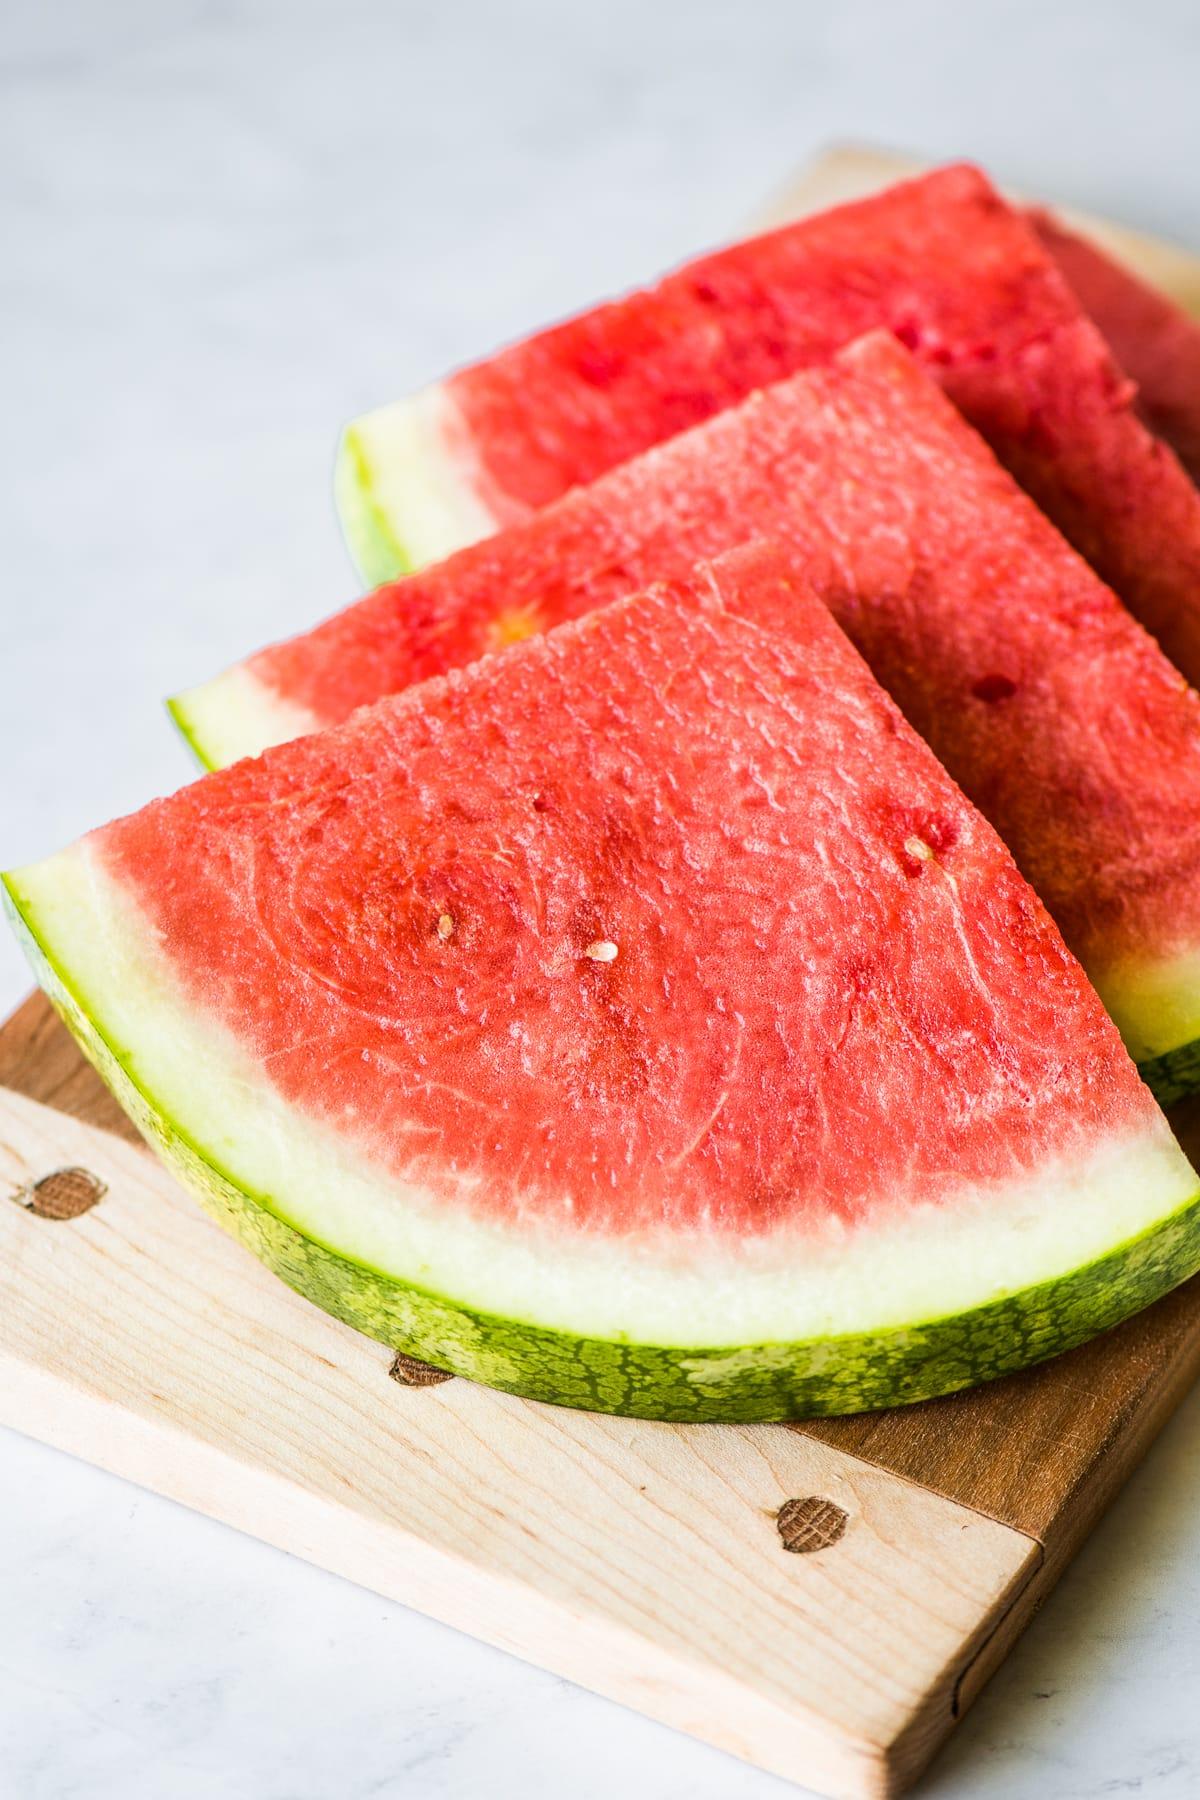 Slices of fresh watermelon on a cutting board.